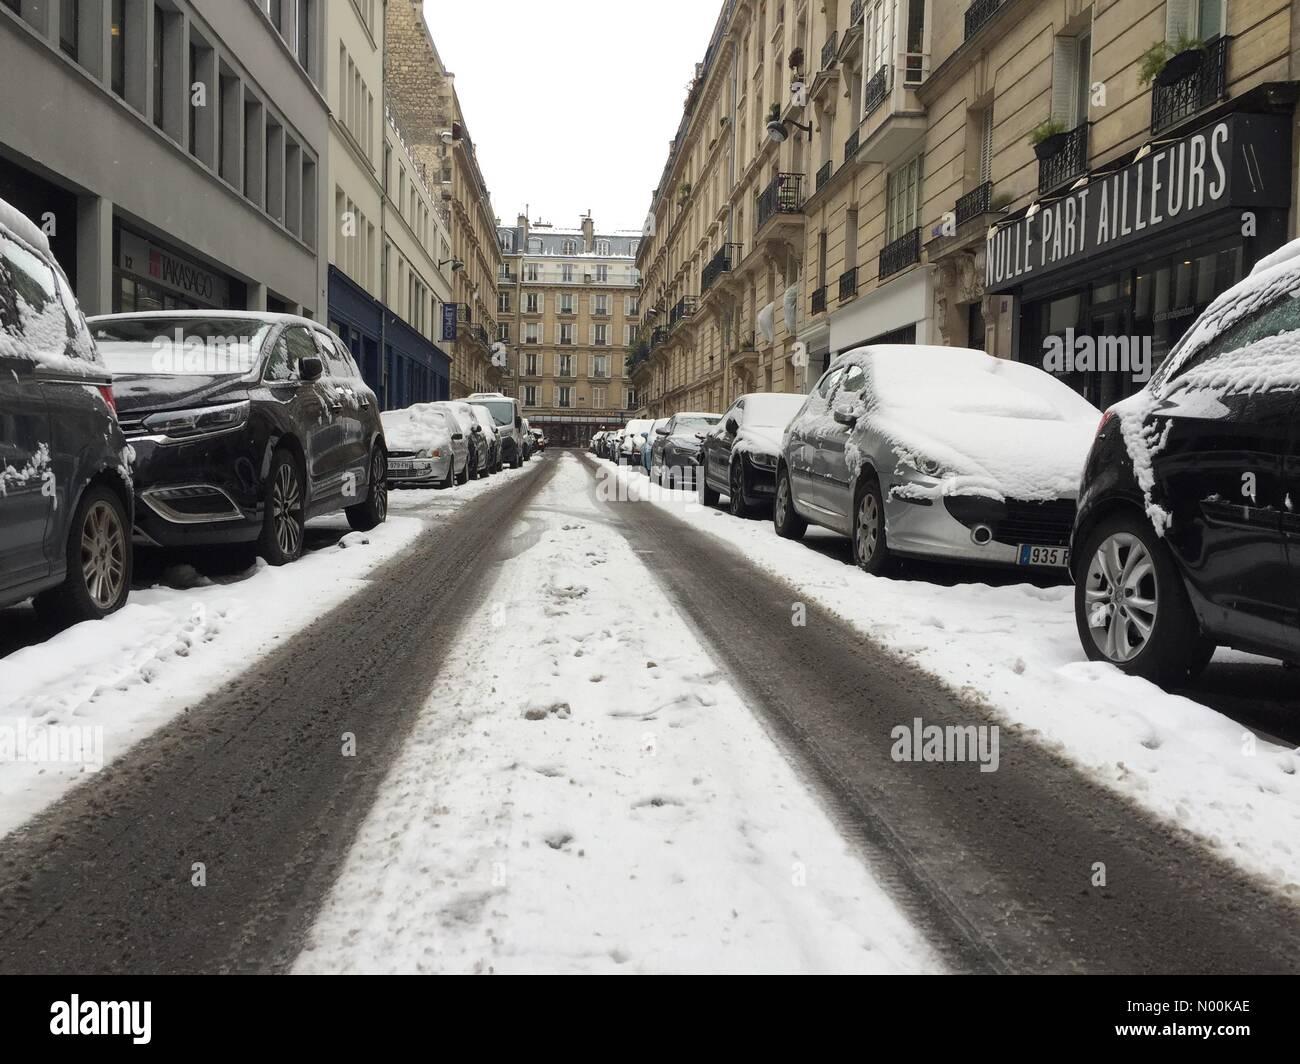 Paris, France. 09th Feb, 2018. Paris is struggling with yet more snow, 15 cm forecast. Paris 9th February, 2018 - Stock Image